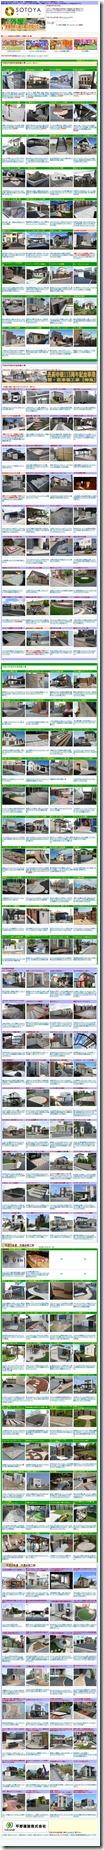 http___www.hira-ken.com_sotoya_sotoya_top.html